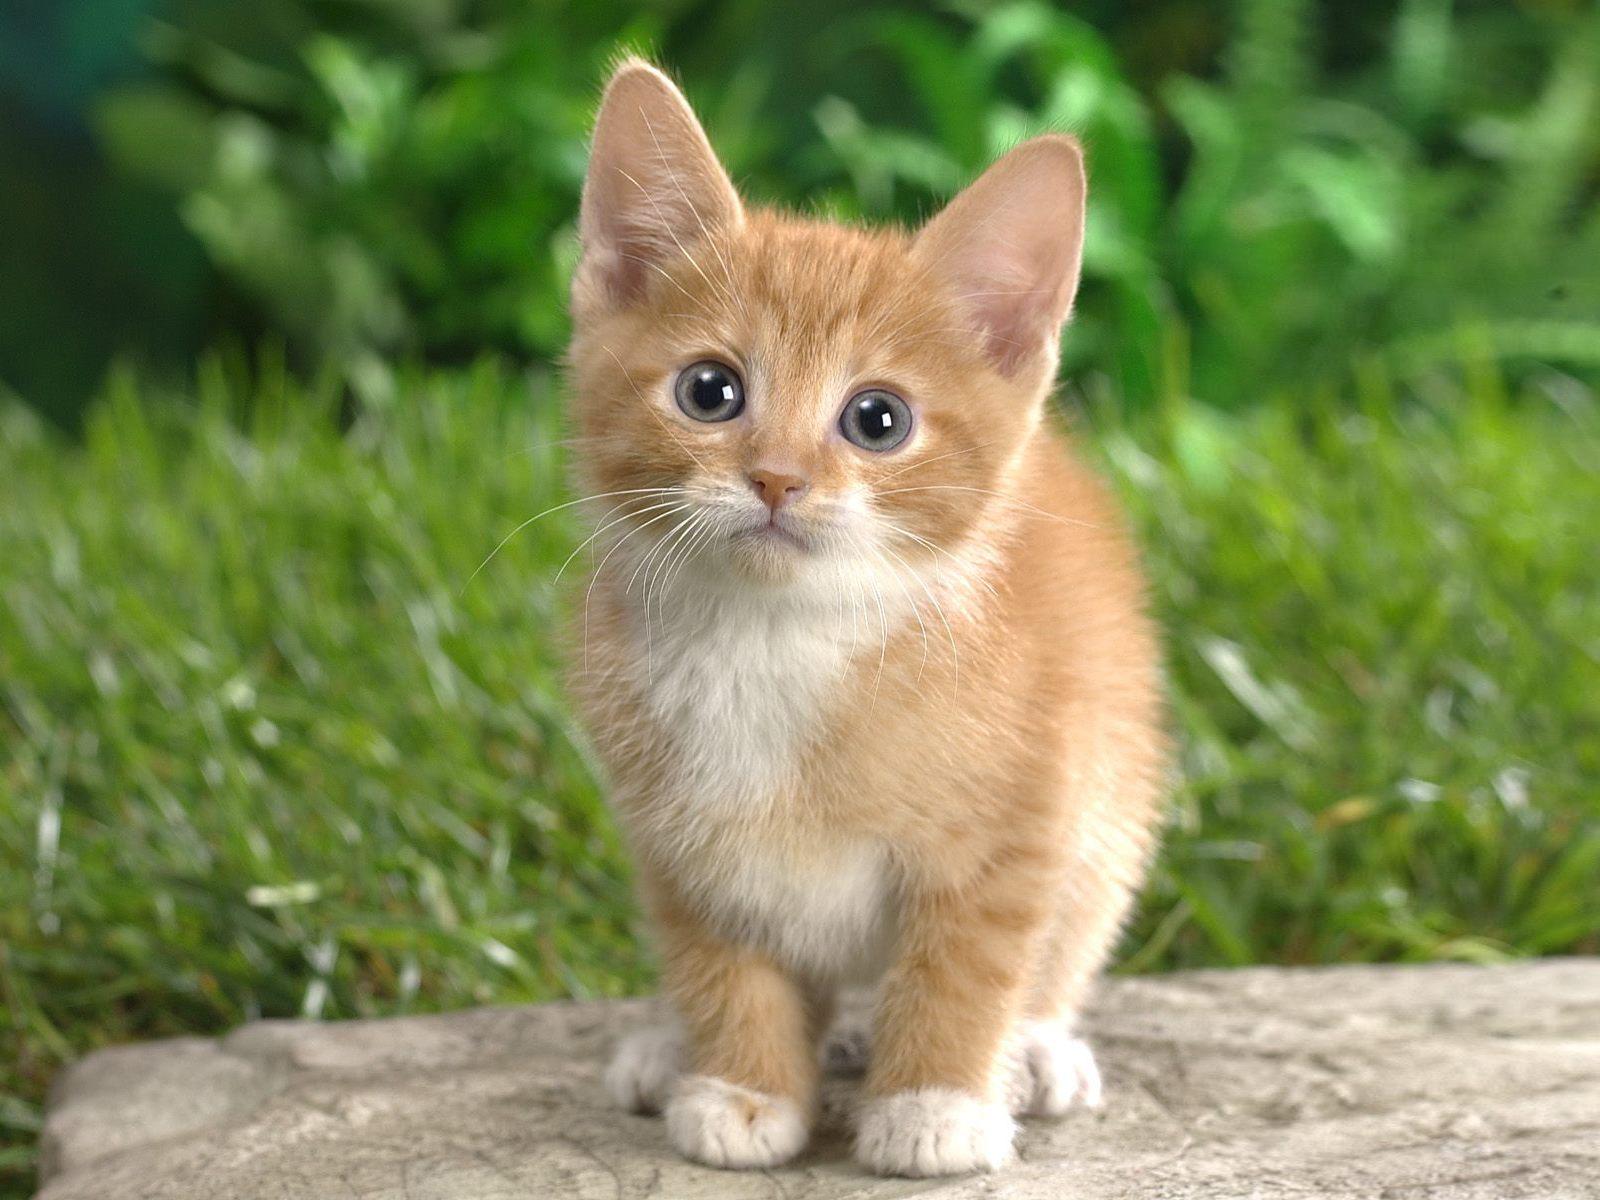 Best desktop hd wallpaper cat desktop wallpapers - Cute kitten backgrounds for desktop ...